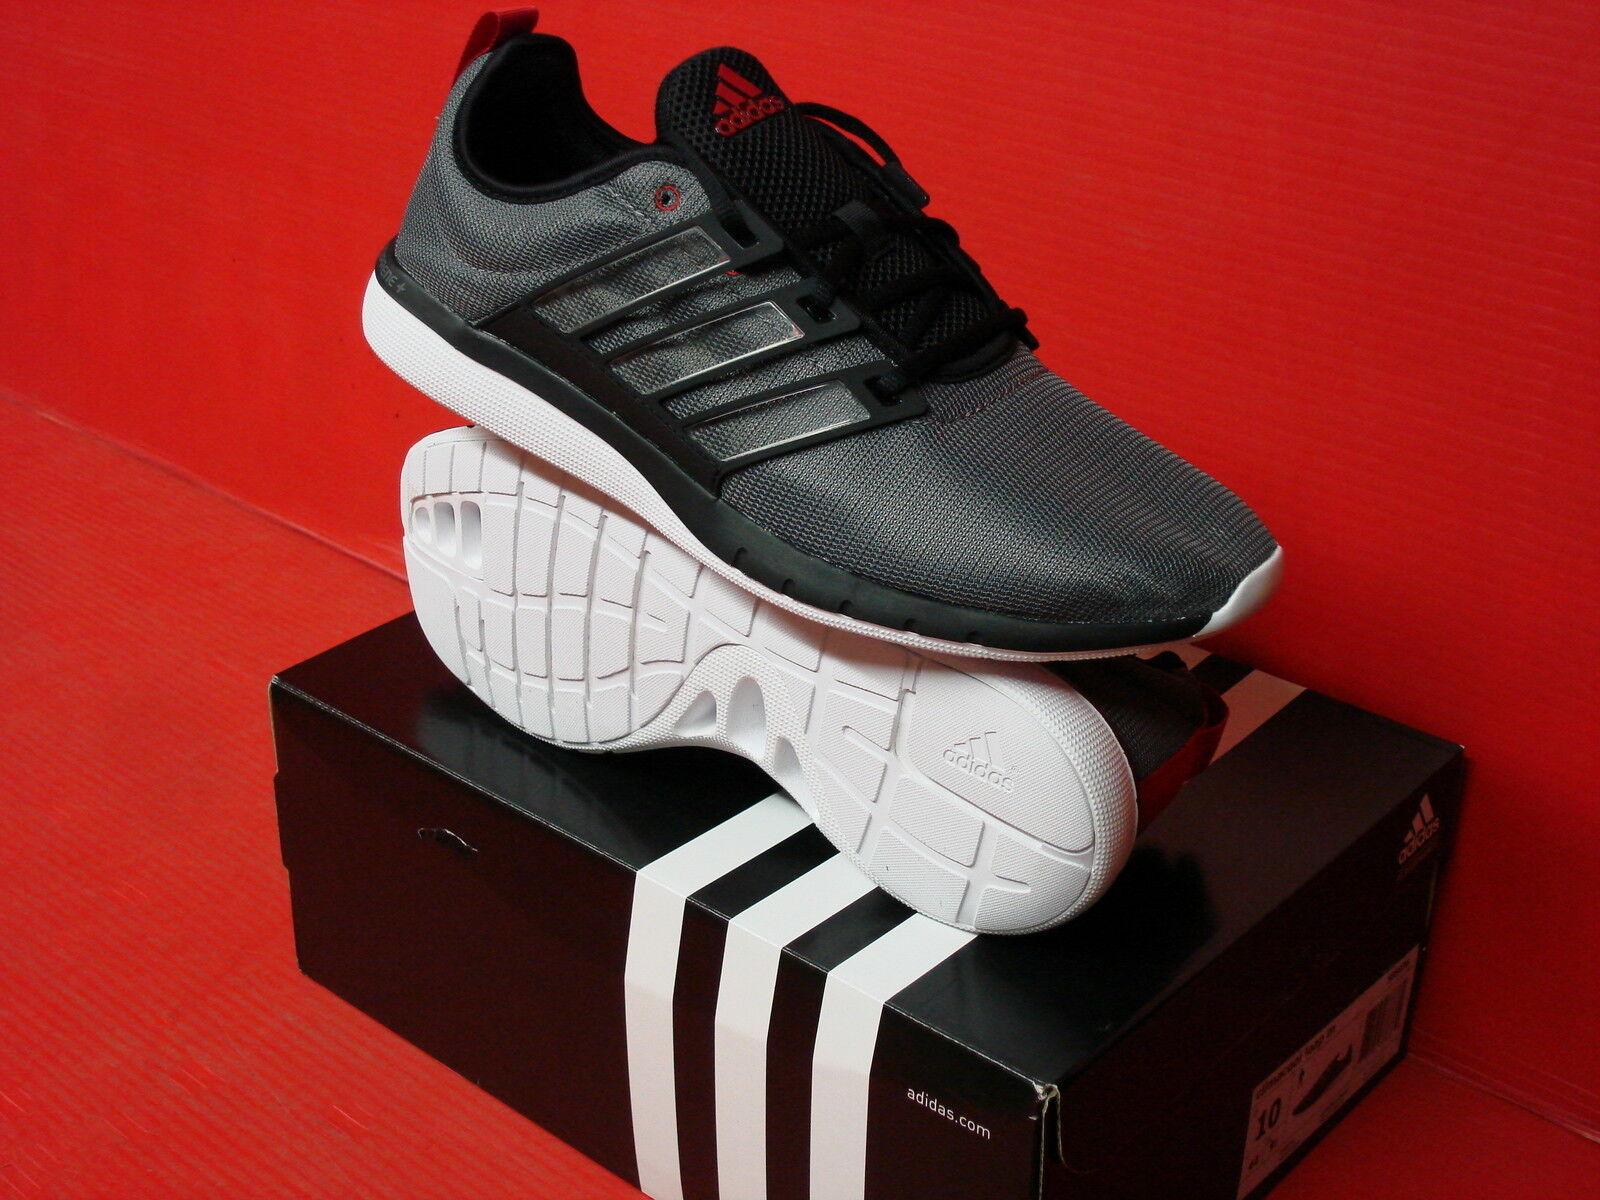 Adidas climacool salto m Hombre running s85036 gran gran s85036 descuento 2abc89